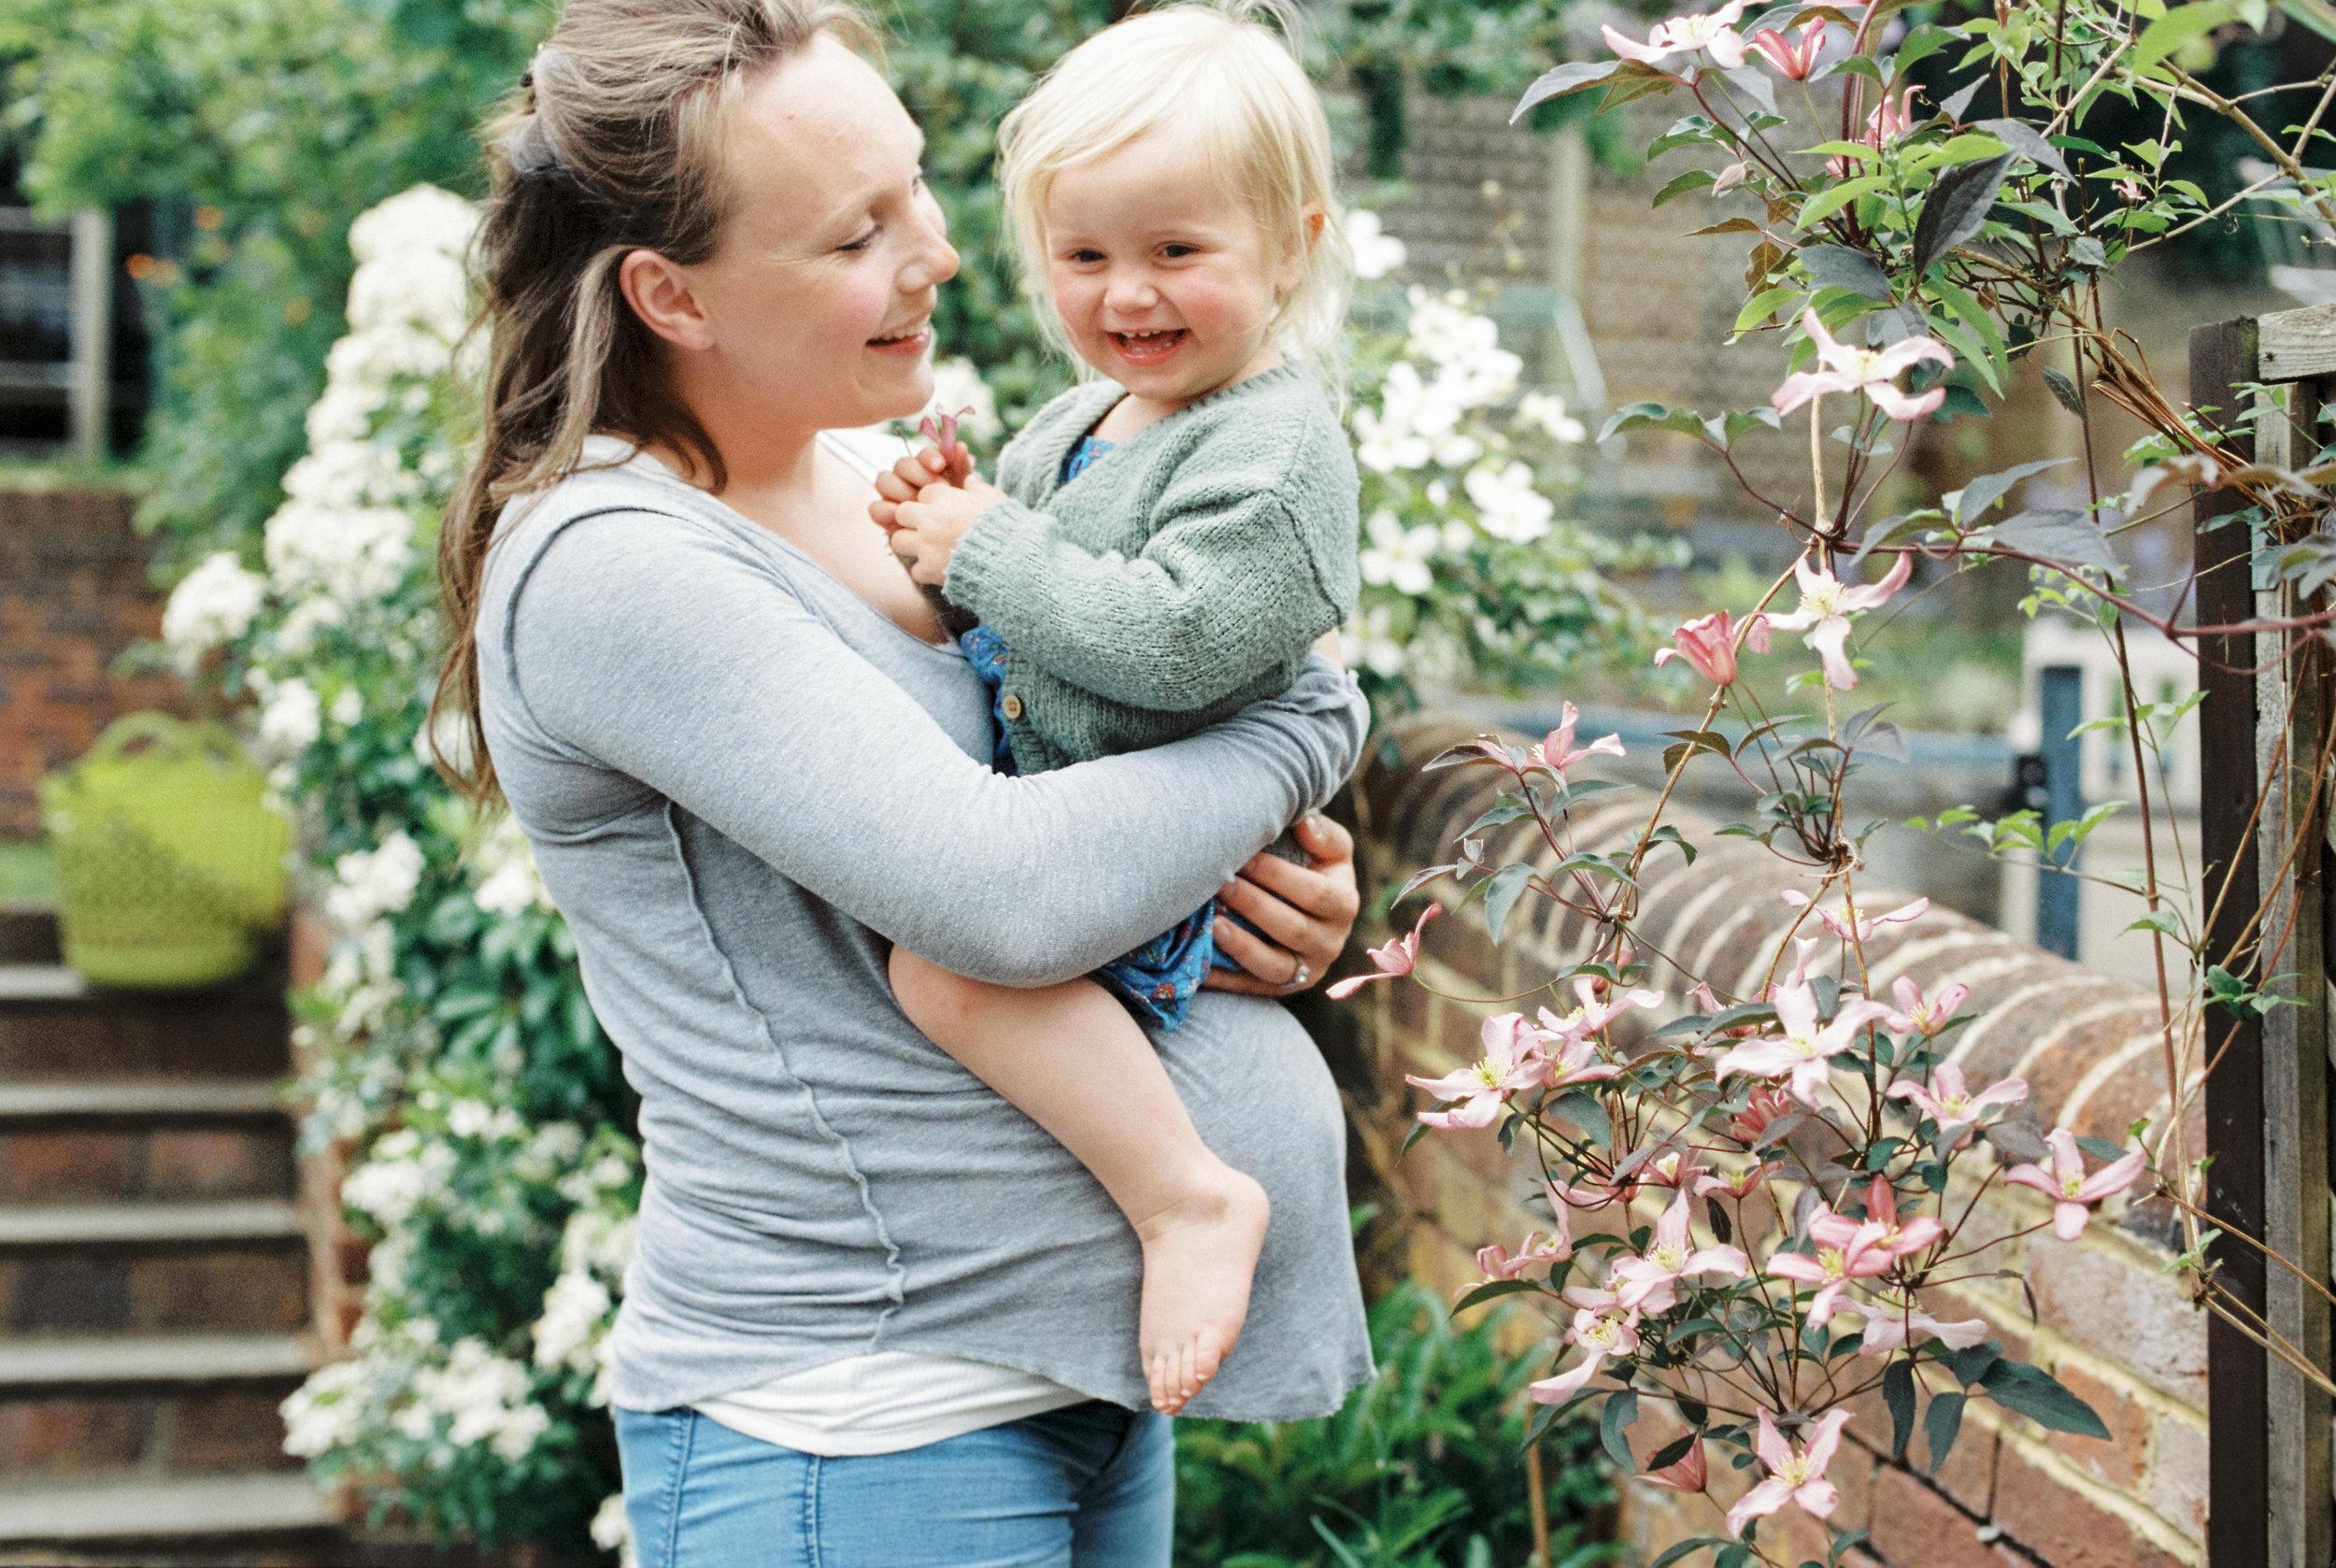 uk-film-photographer-london-family-natural-photography-86.jpg